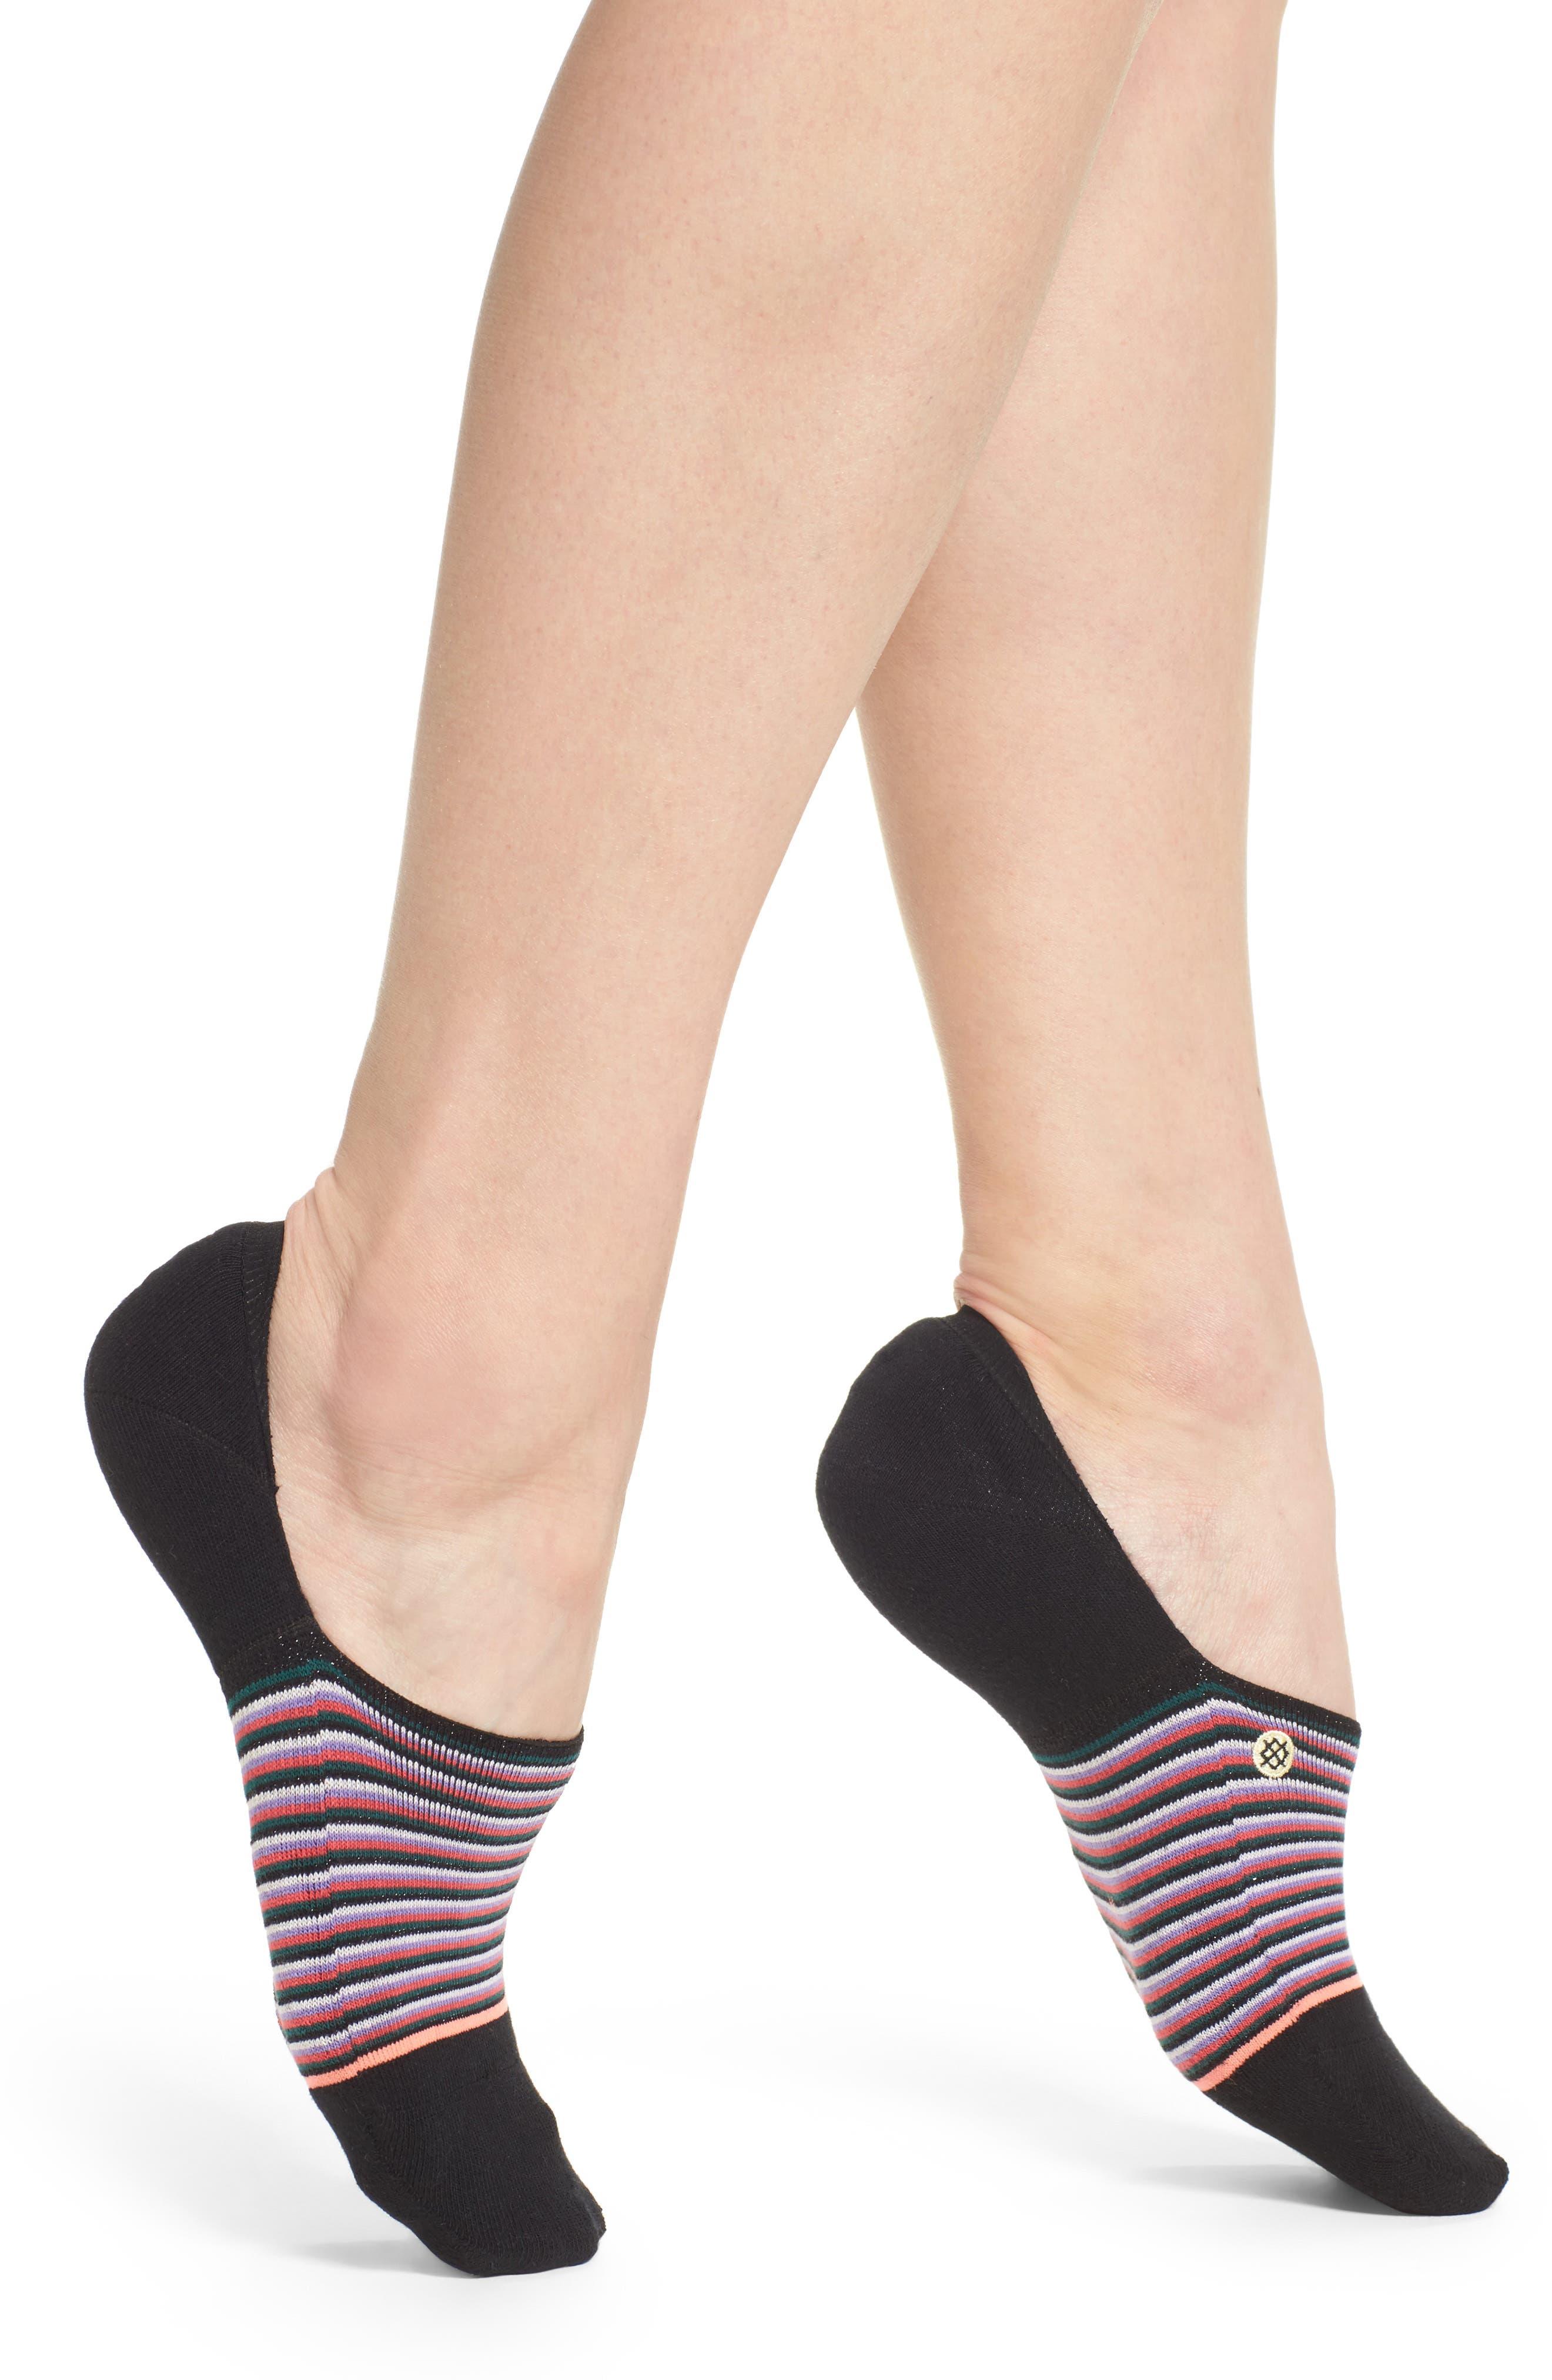 STANCE Summerland No-Show Socks, Main, color, 001